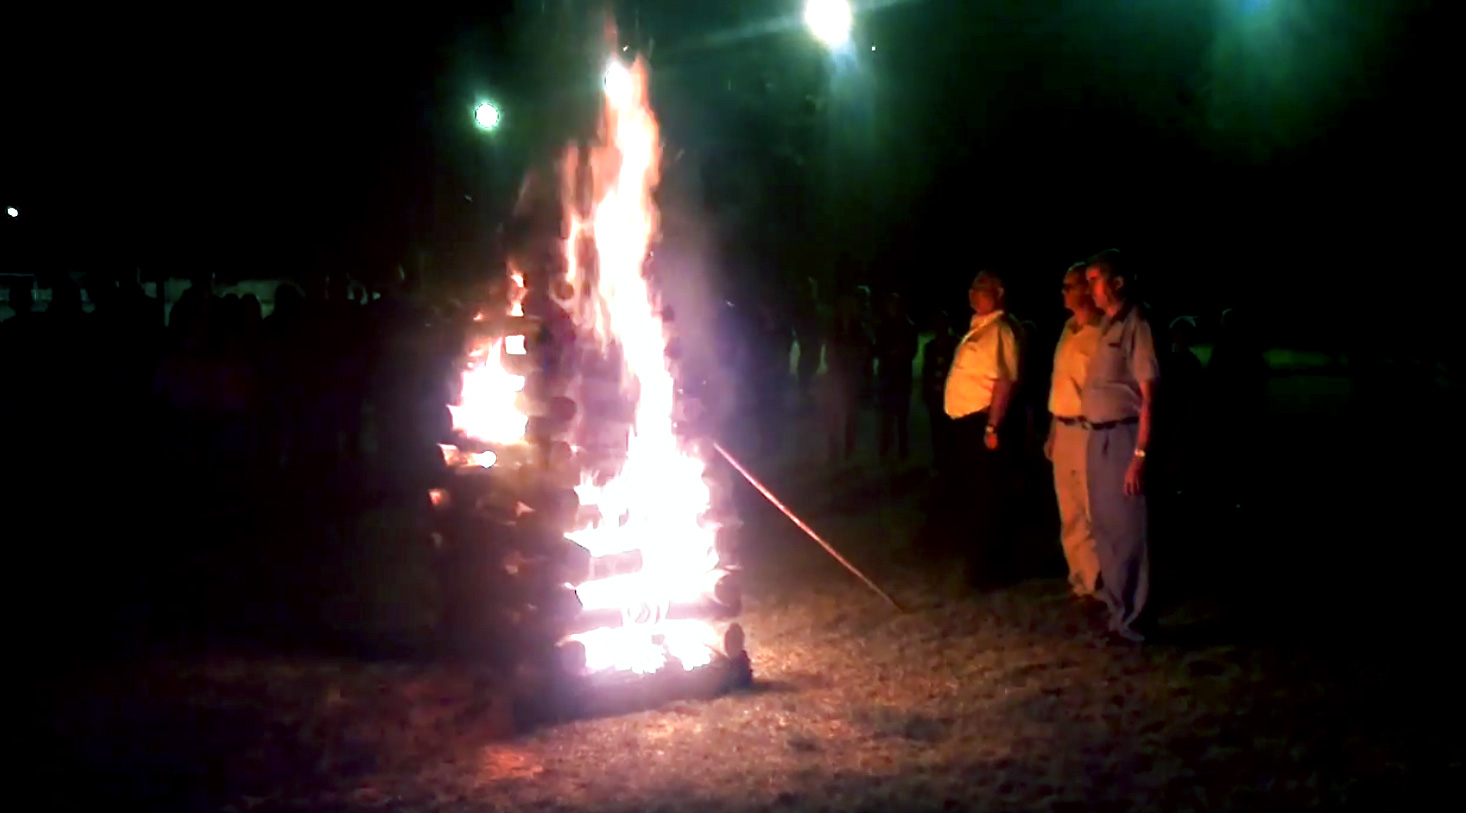 Vatra Ústavy Abrahám